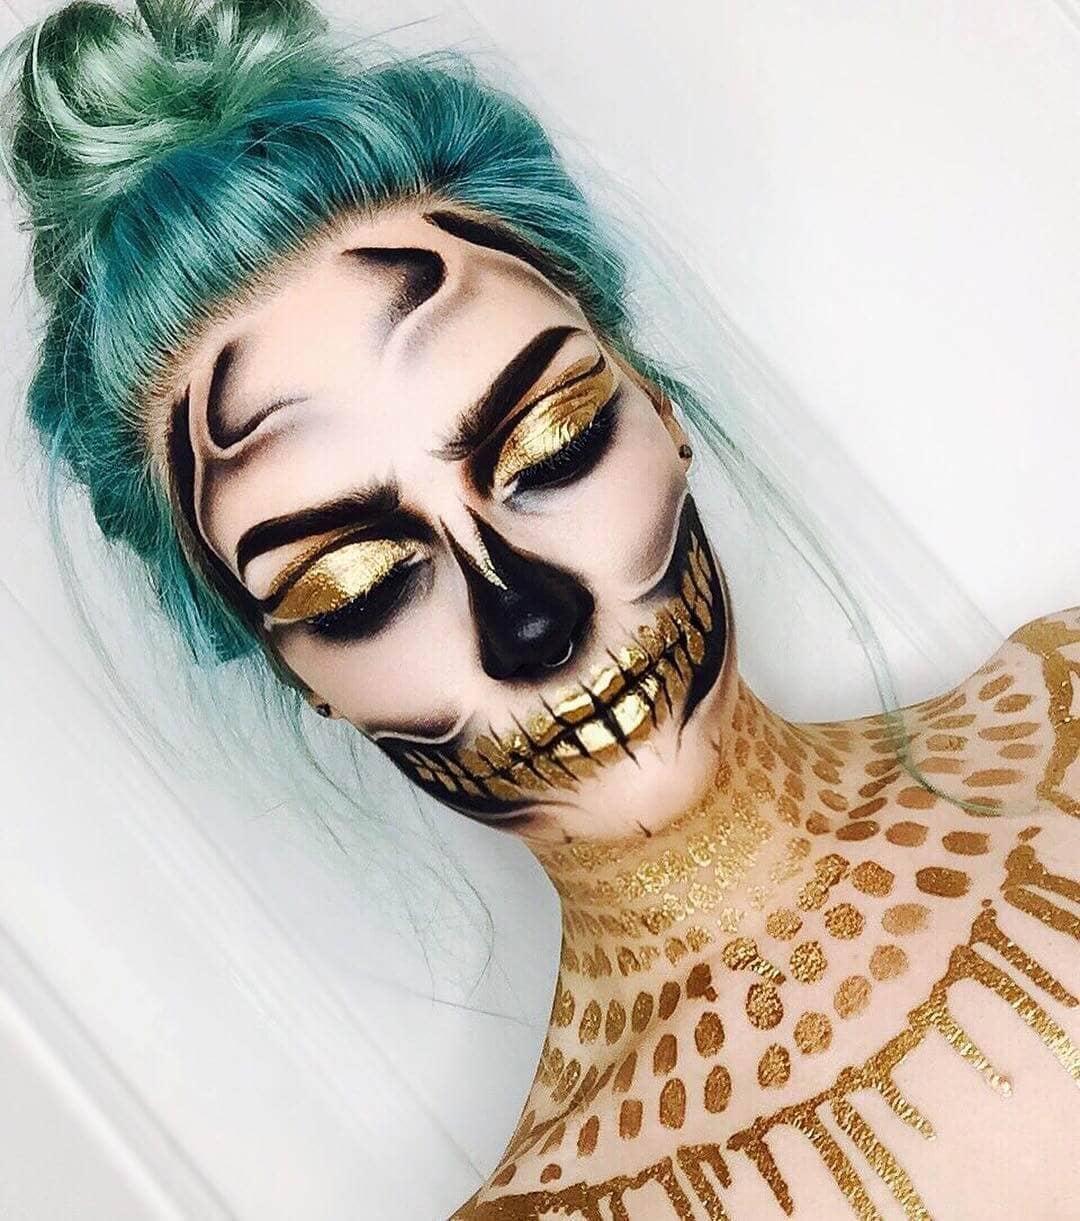 The Golden Corpse-Bride